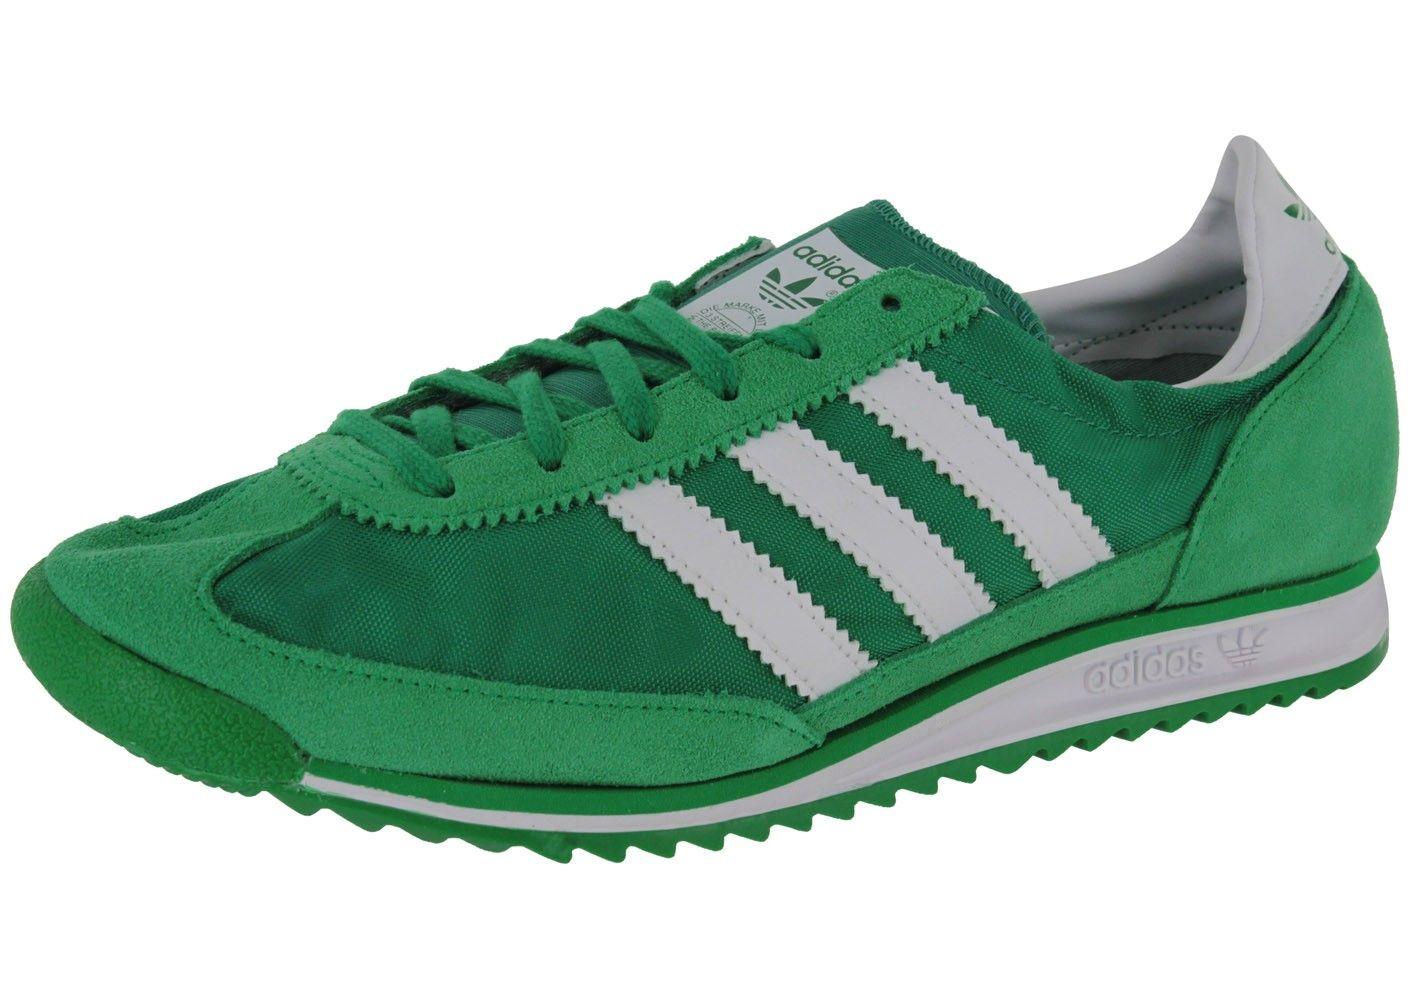 Chaussures Adidas Sl 72 Verte Vue Avant